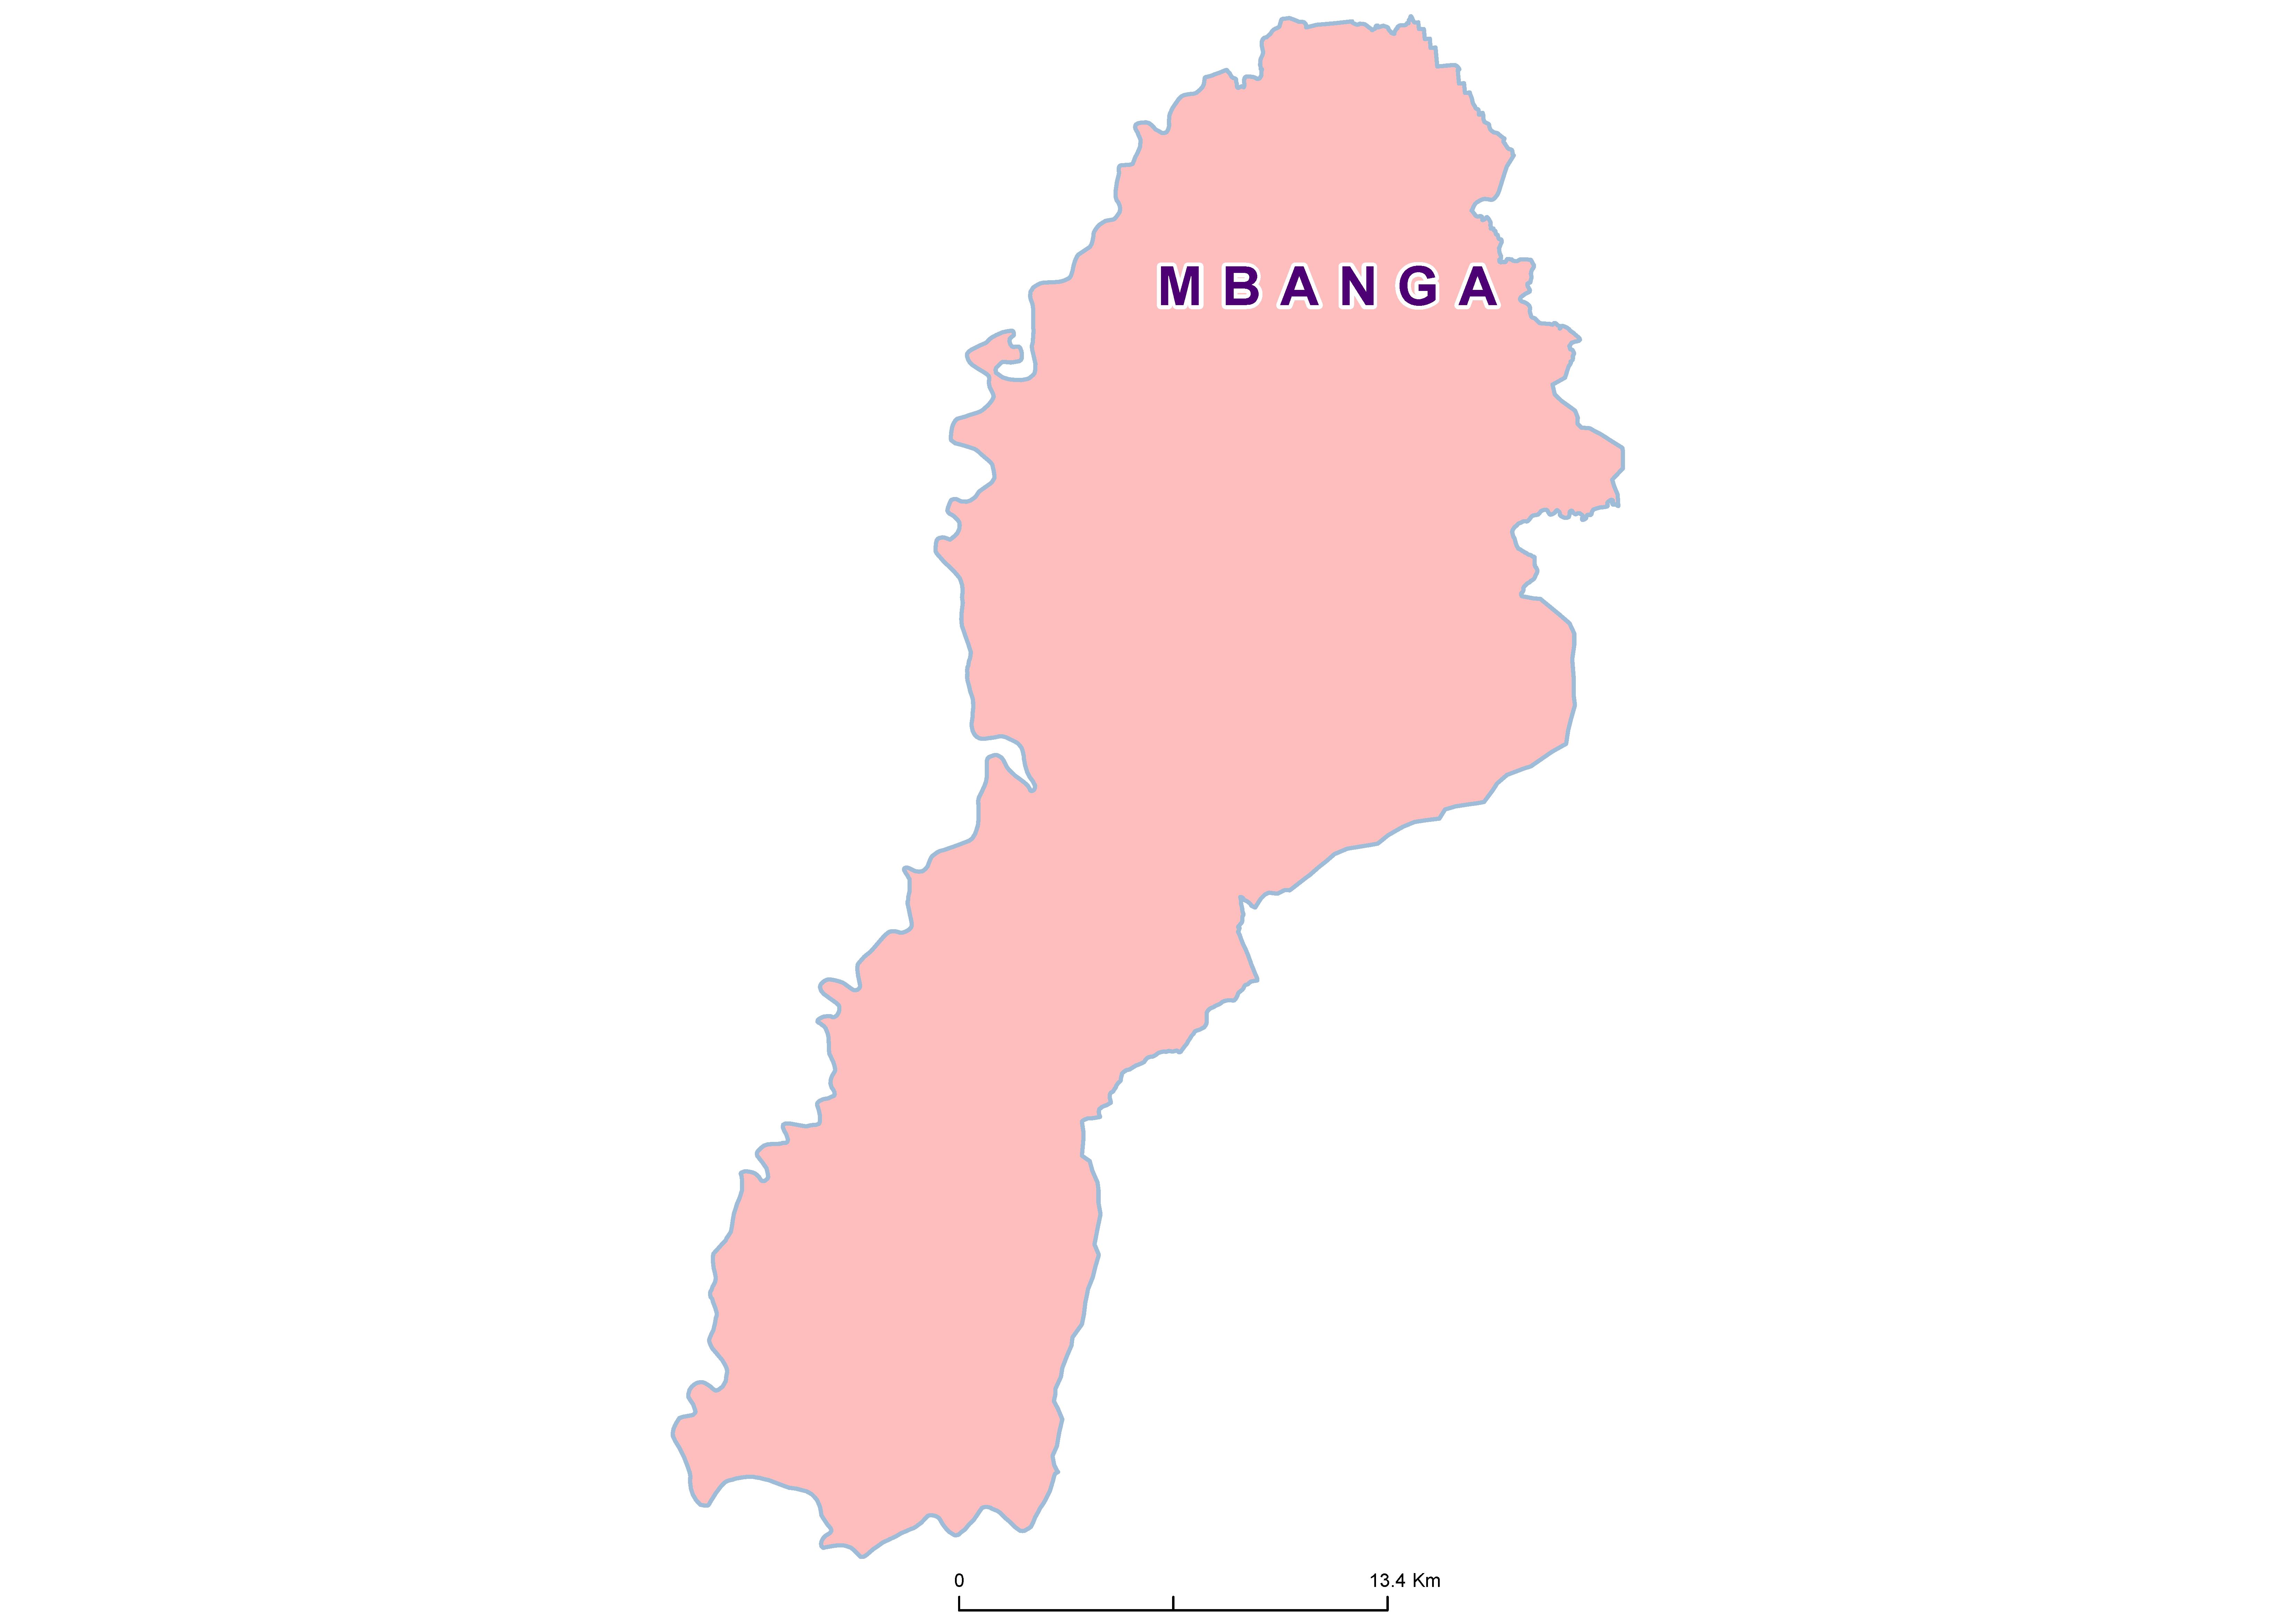 Mbanga Mean SCH 20100001